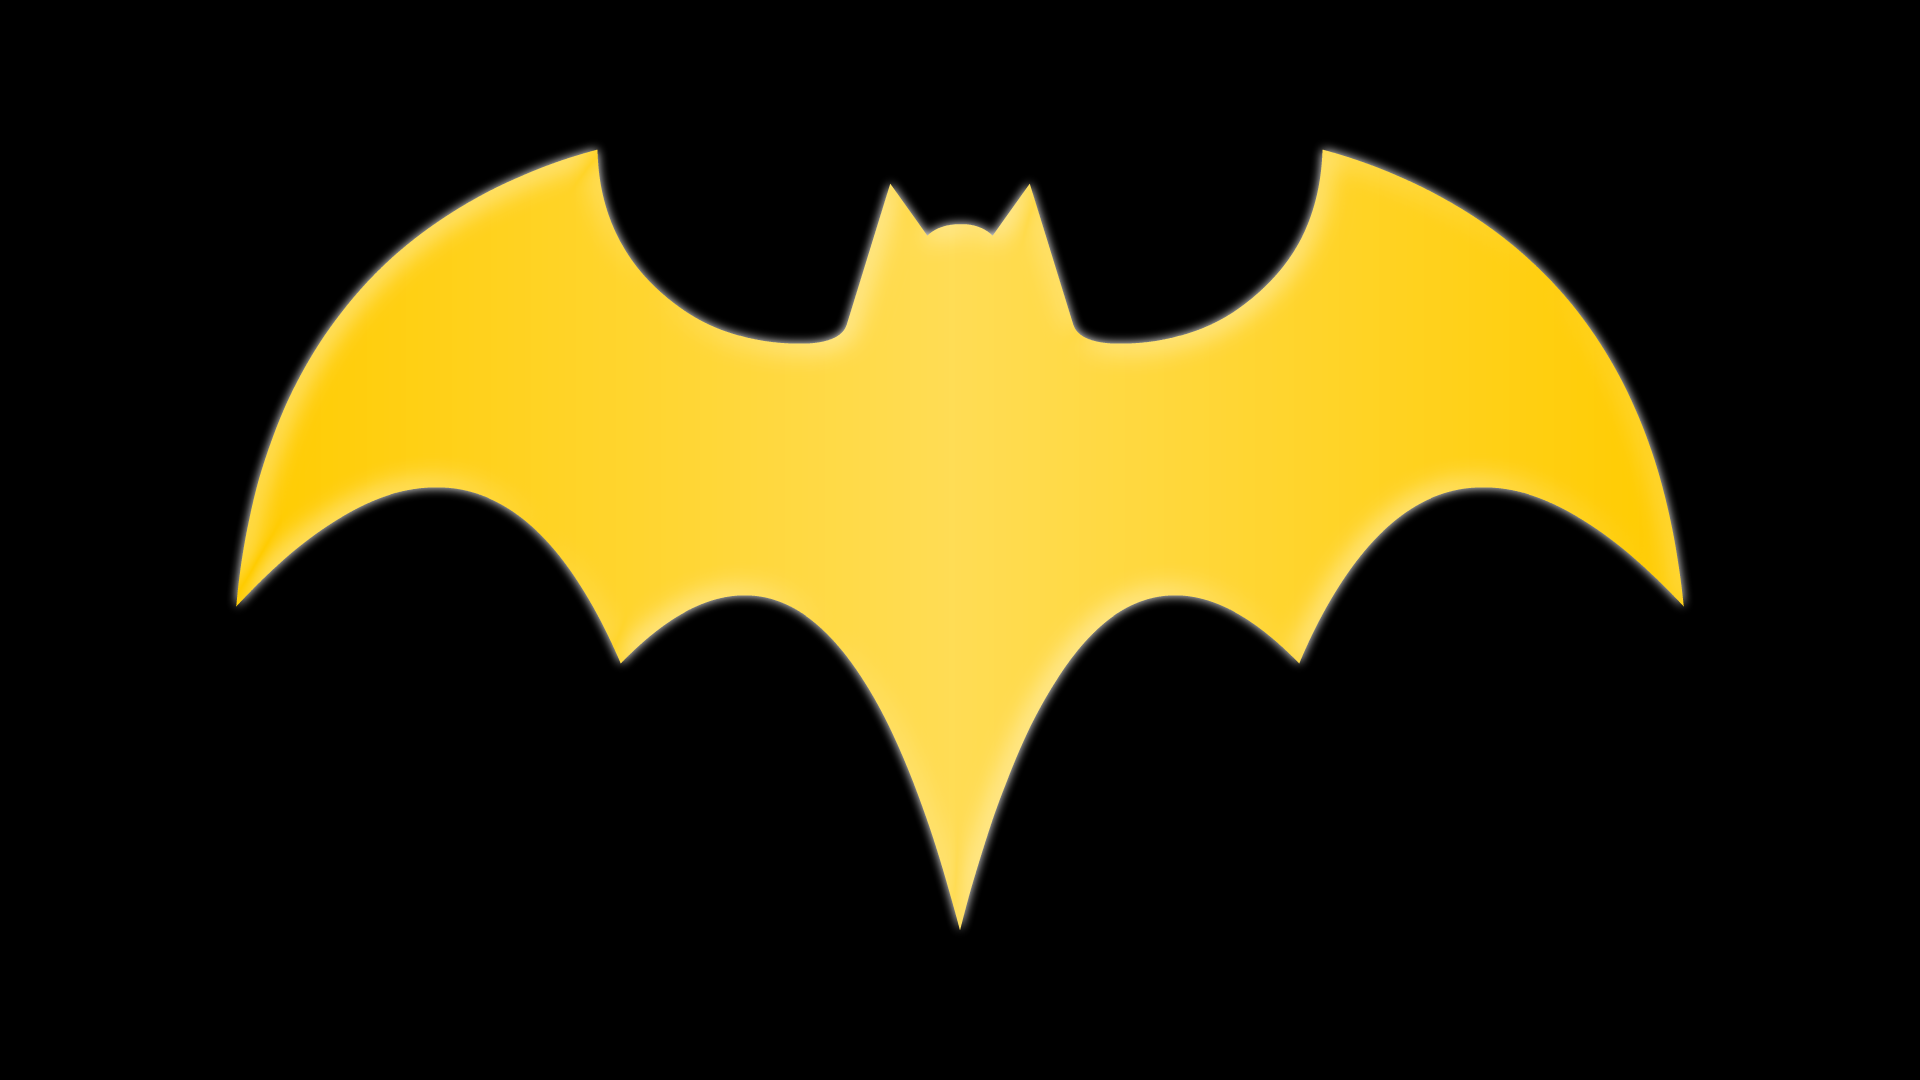 Dc nightwing insignia clipart black and white freeuse Batgirl Symbol by Yurtigo on DeviantArt | Batman & Batgirl | Batgirl ... freeuse